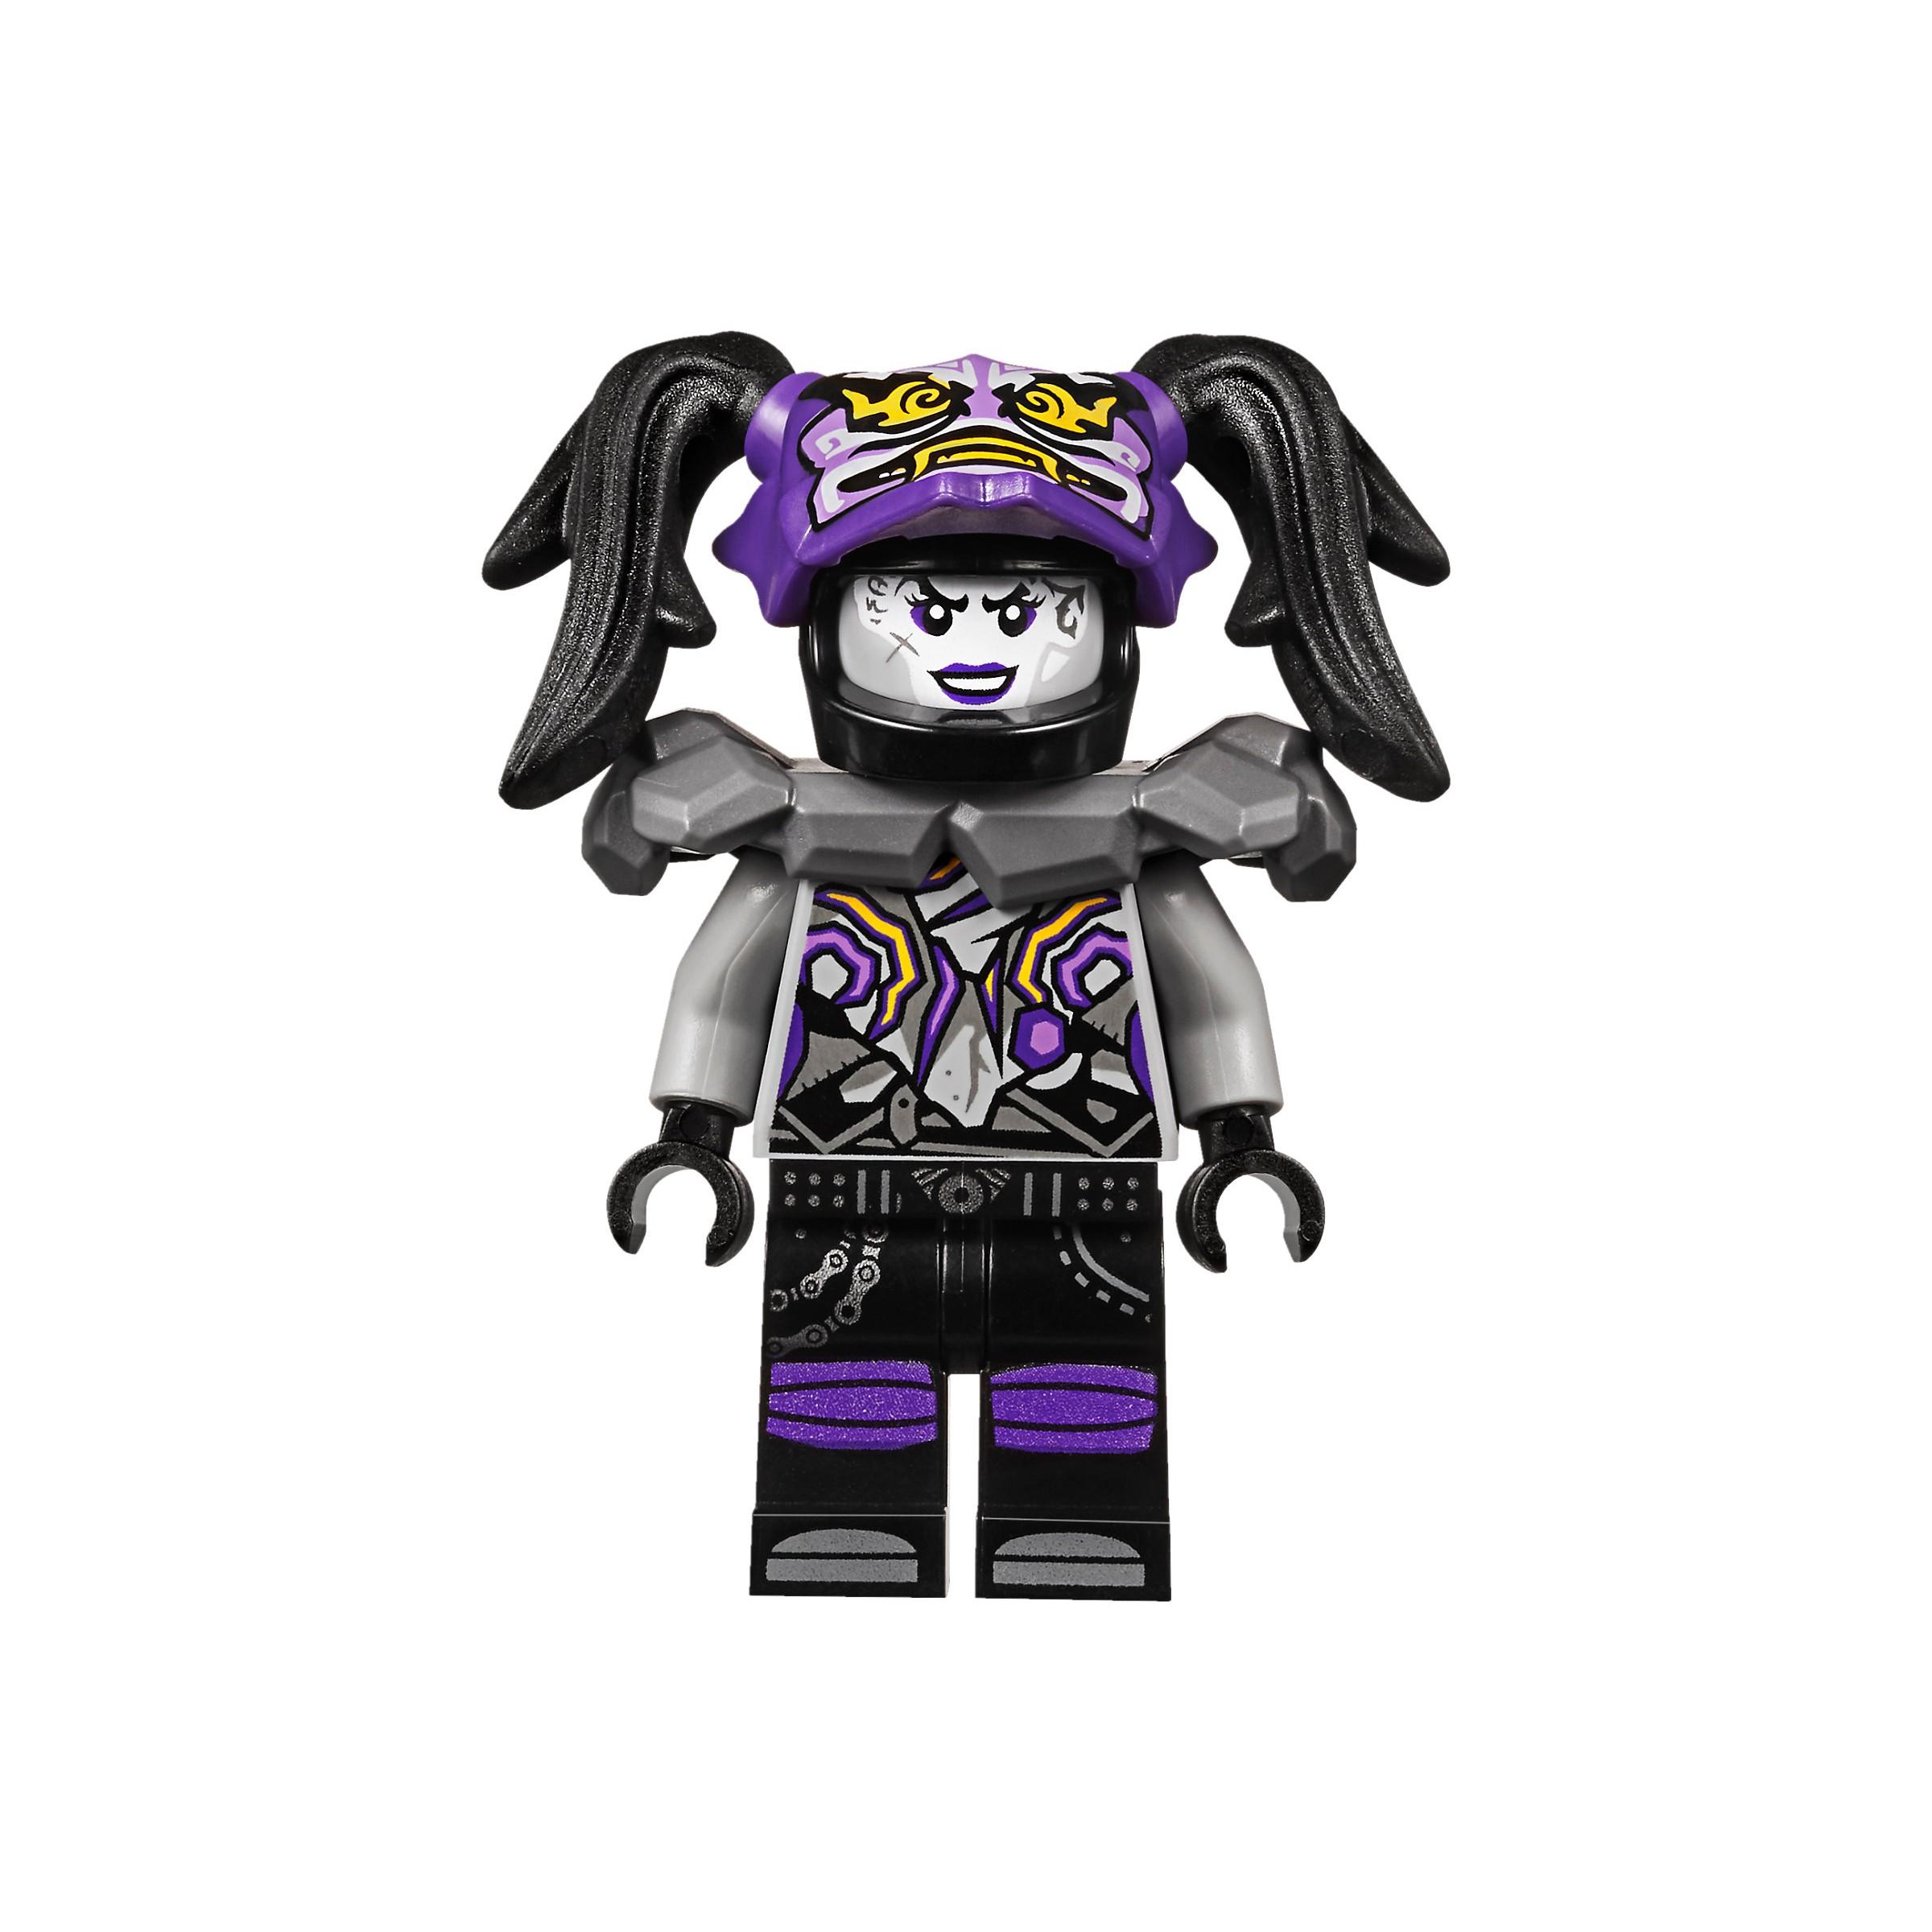 Lego 70641 Ninjago Ninja Nightcrawler At Hobby Warehouse